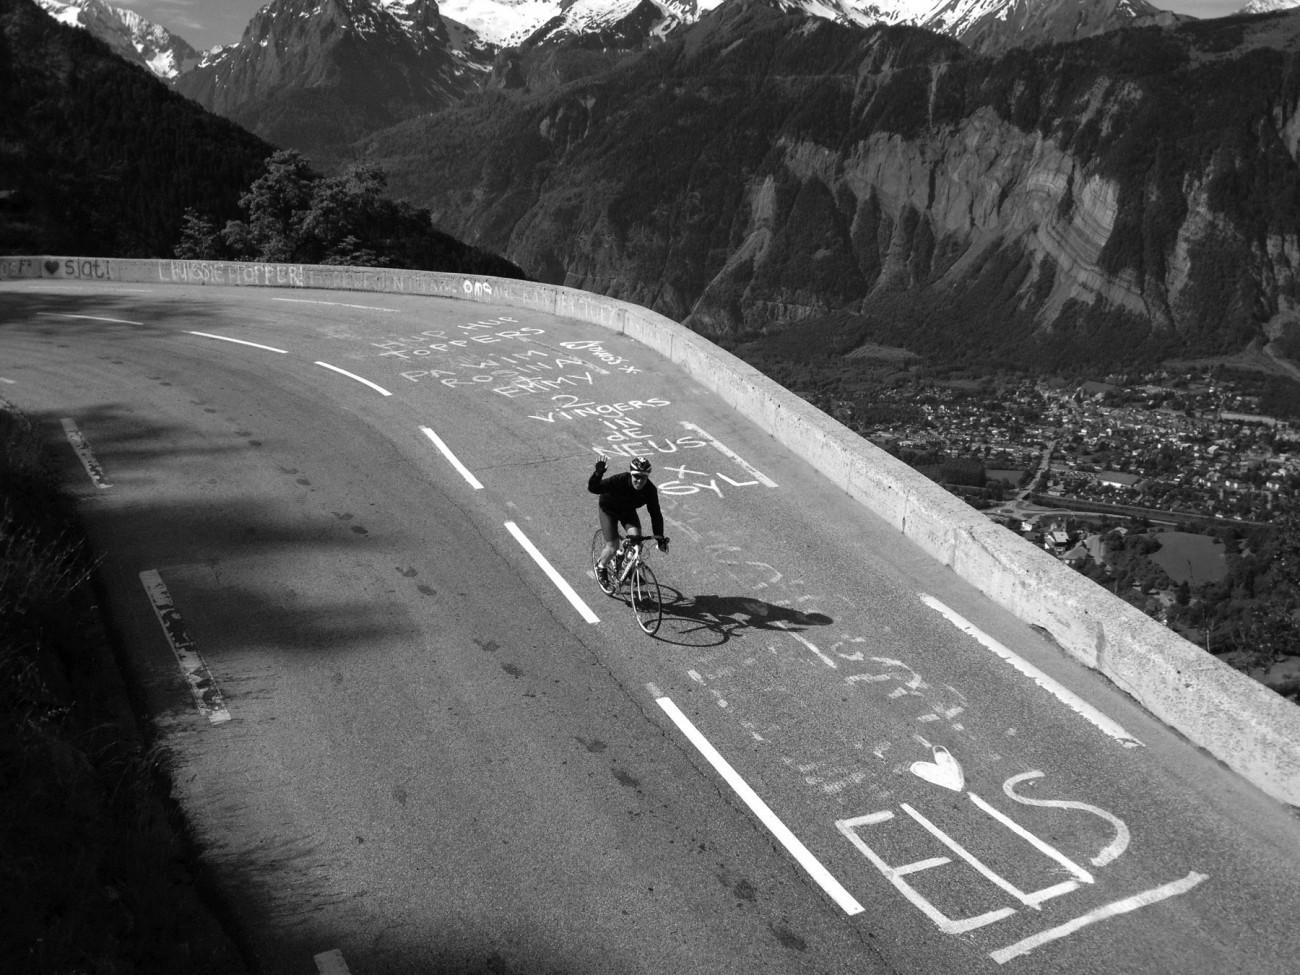 Alp d'Huez decent